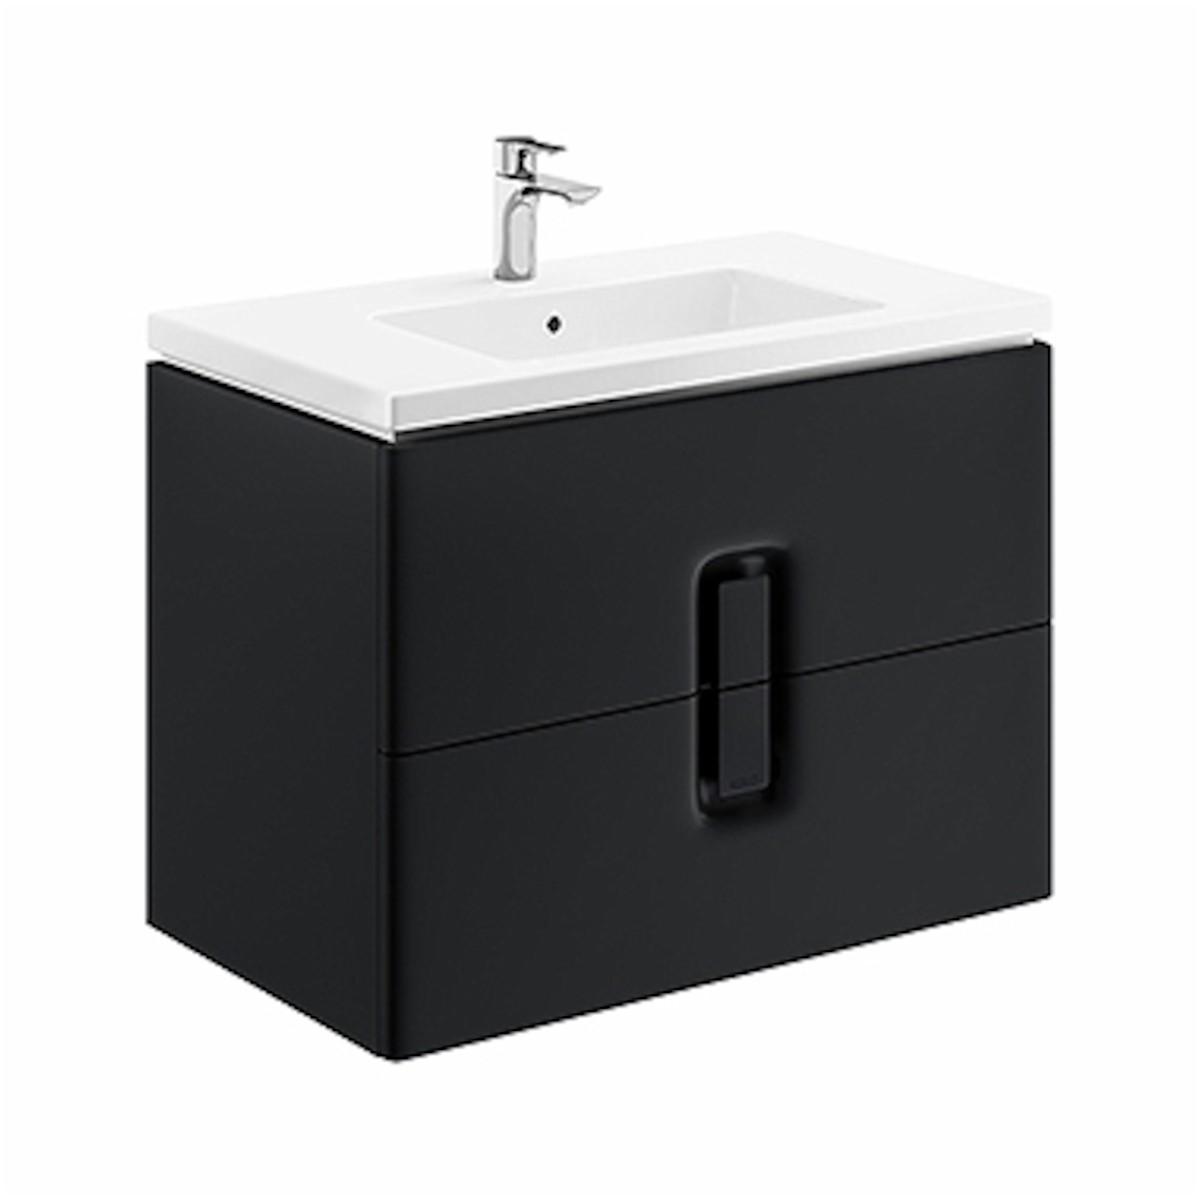 Kúpeľňová skrinka pod umývadlo Kolo Twins 80x46x57 cm čierna mat 89555000